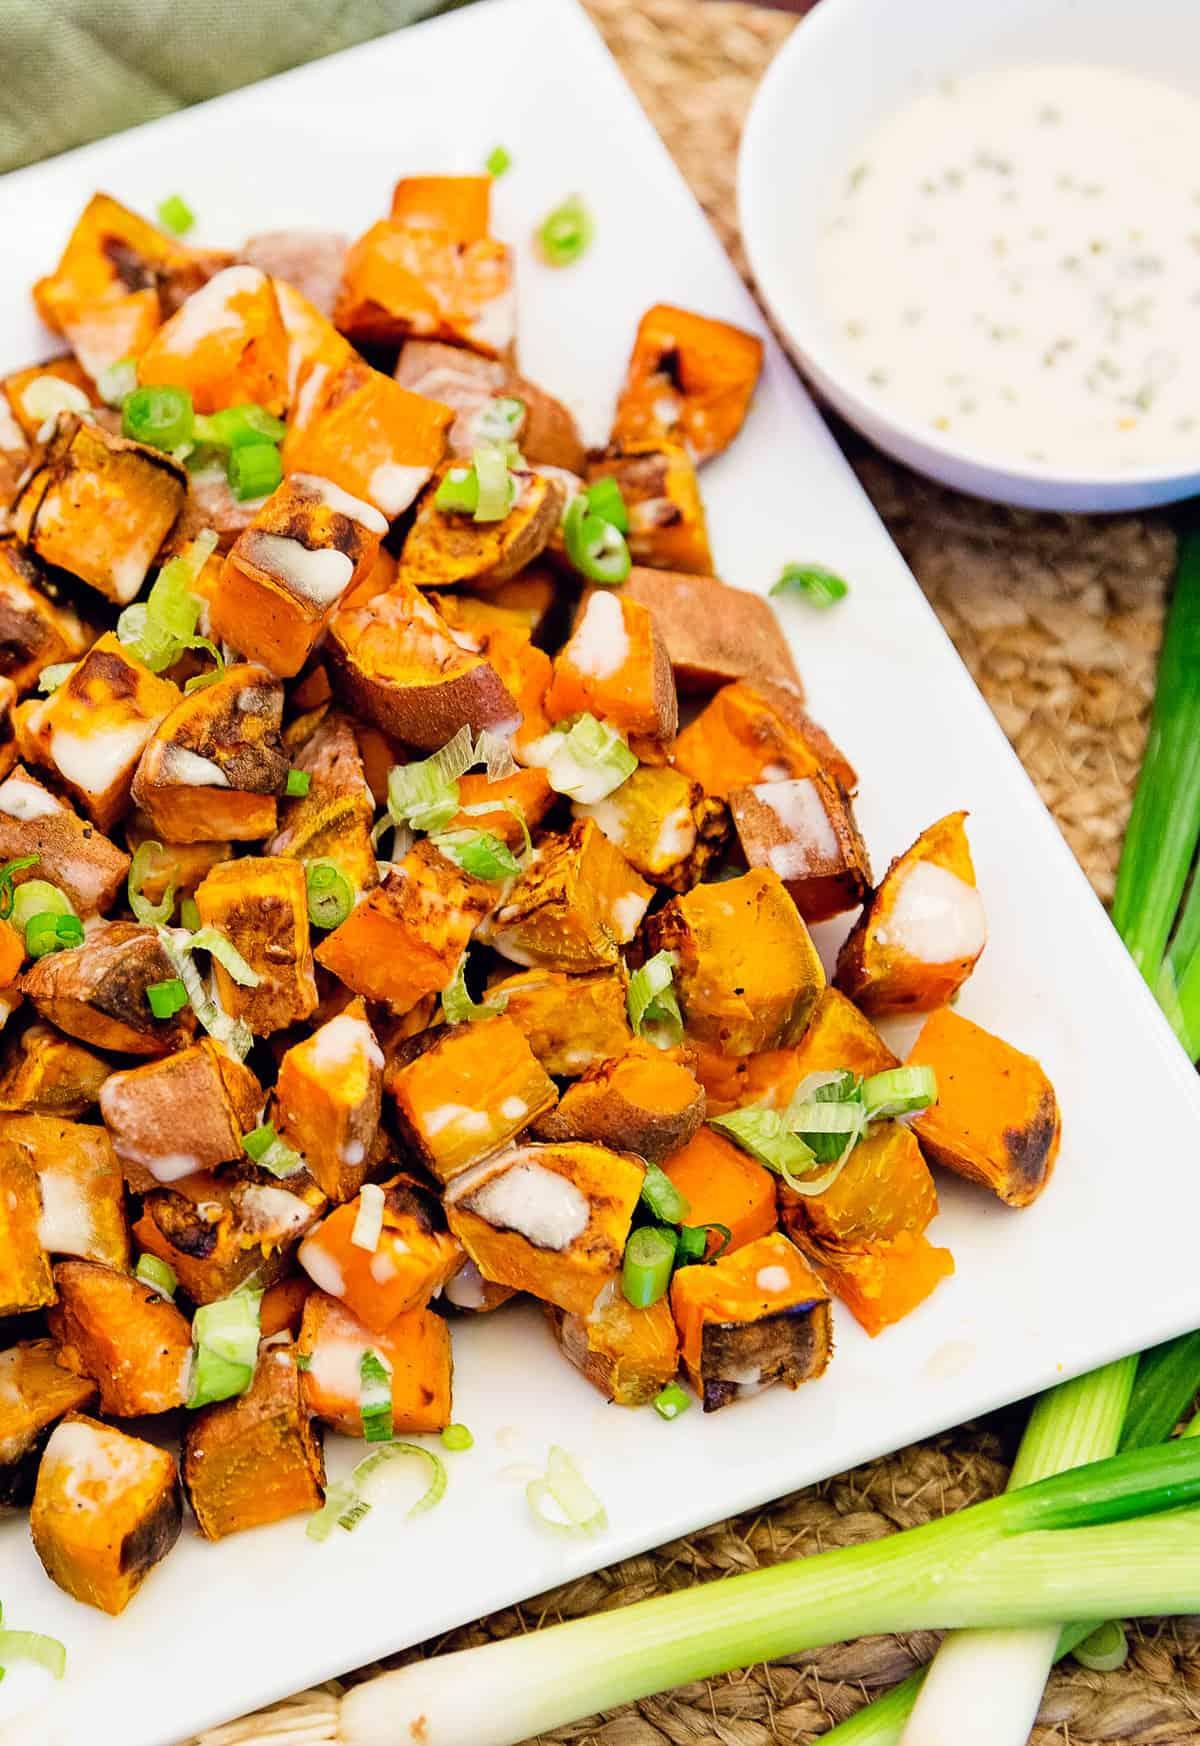 Organic Potatoes Whole Foods